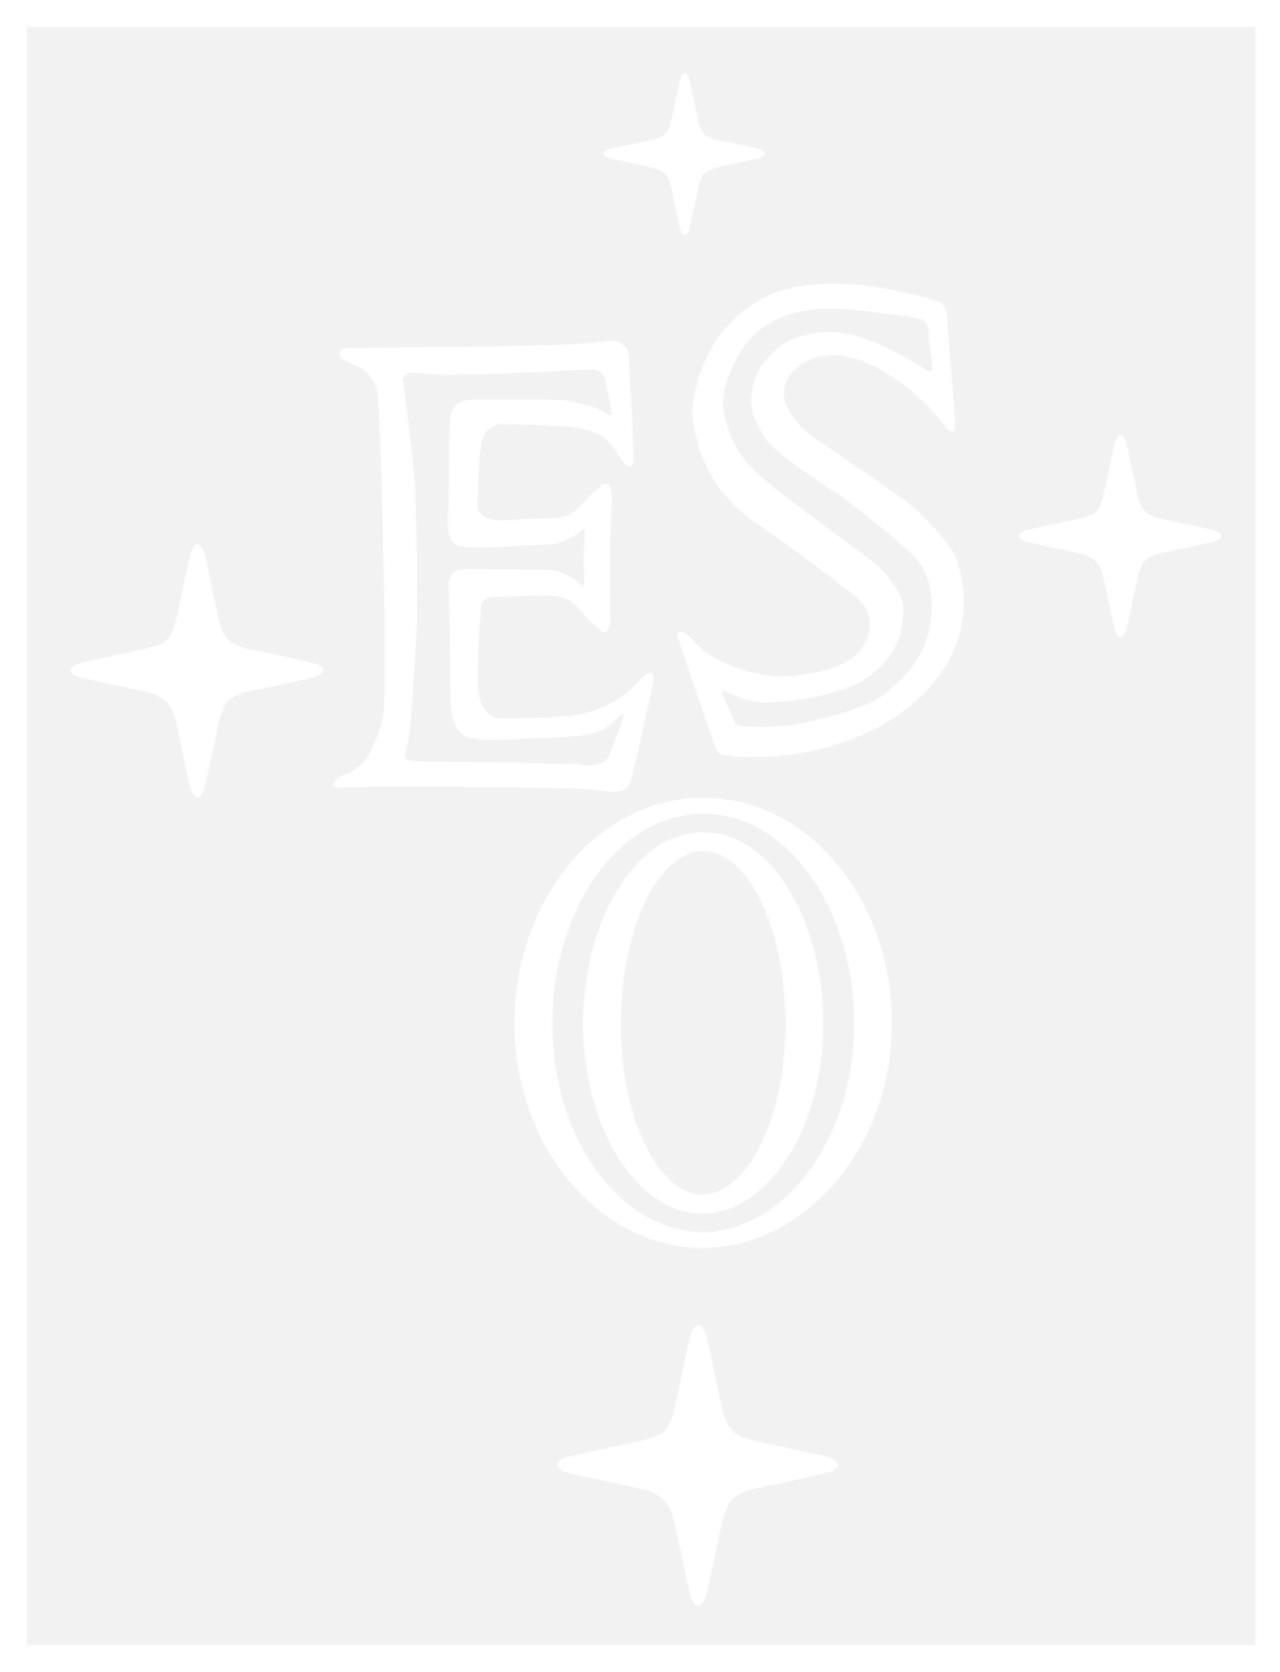 eso logo outline white with transparent background eso ireland